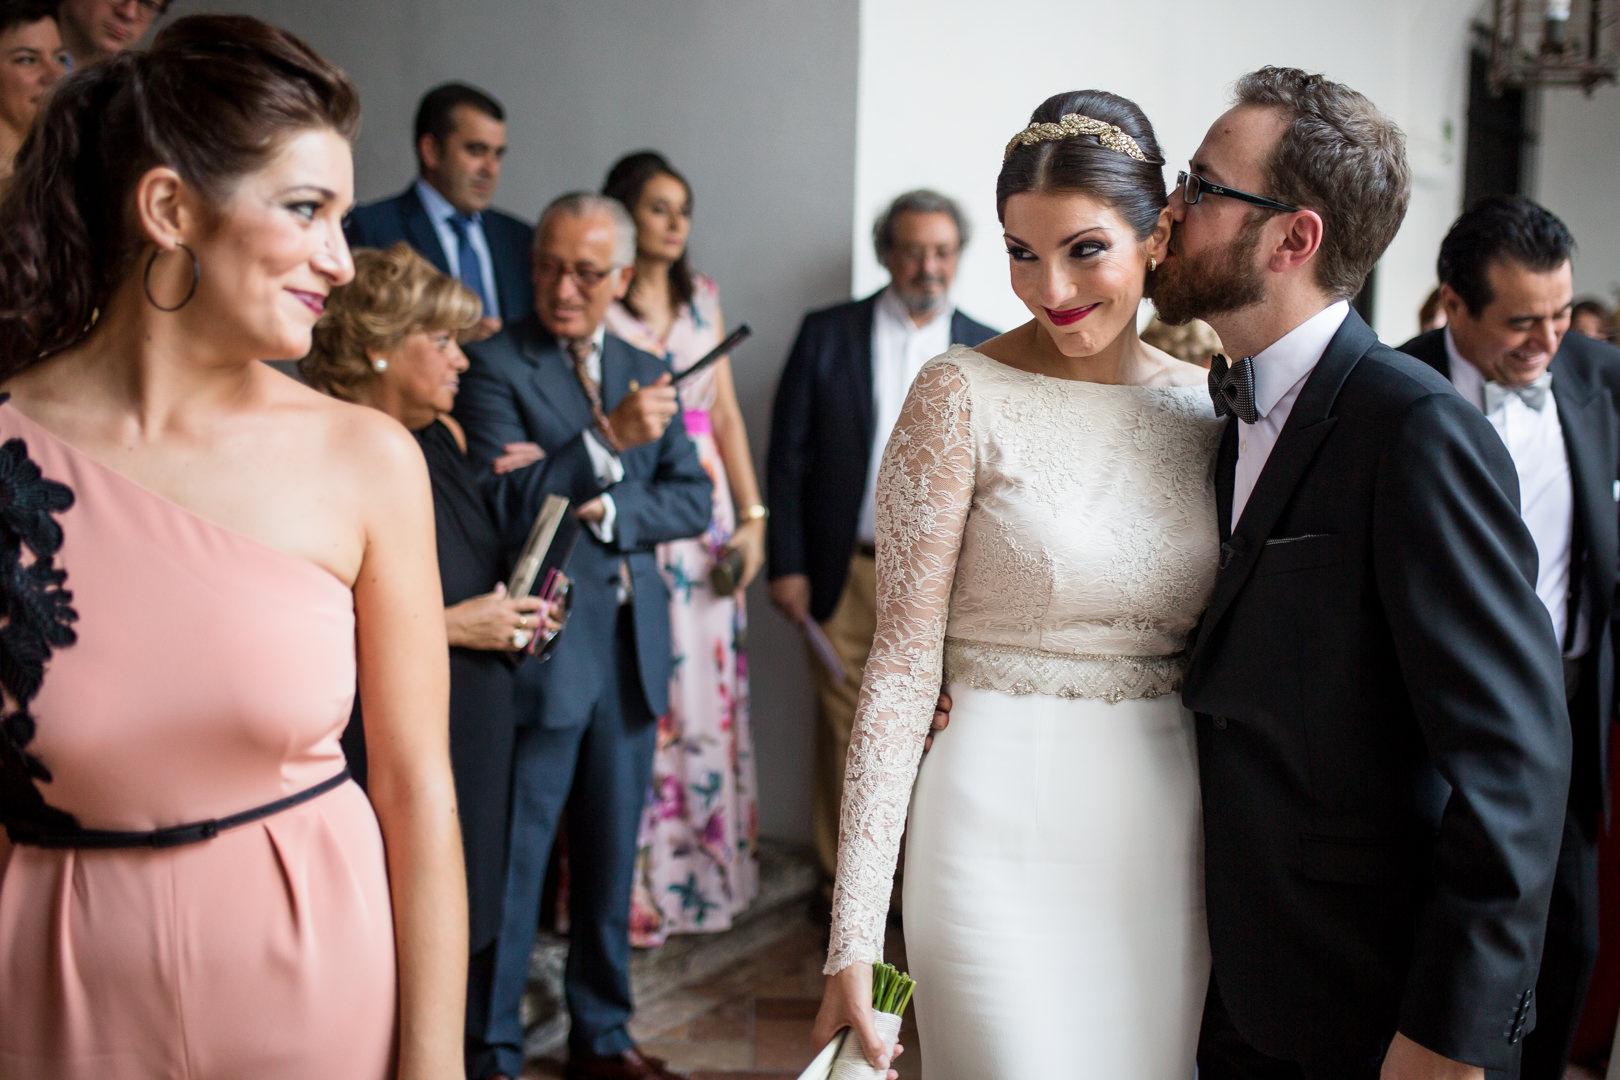 Boda-Sevilla-Museo-Carmona-Hamburgo-Maria-Carles-engagement-Rafael-Torres-fotografo-bodas-sevilla-madrid-barcelona-wedding-photographer--26.jpg